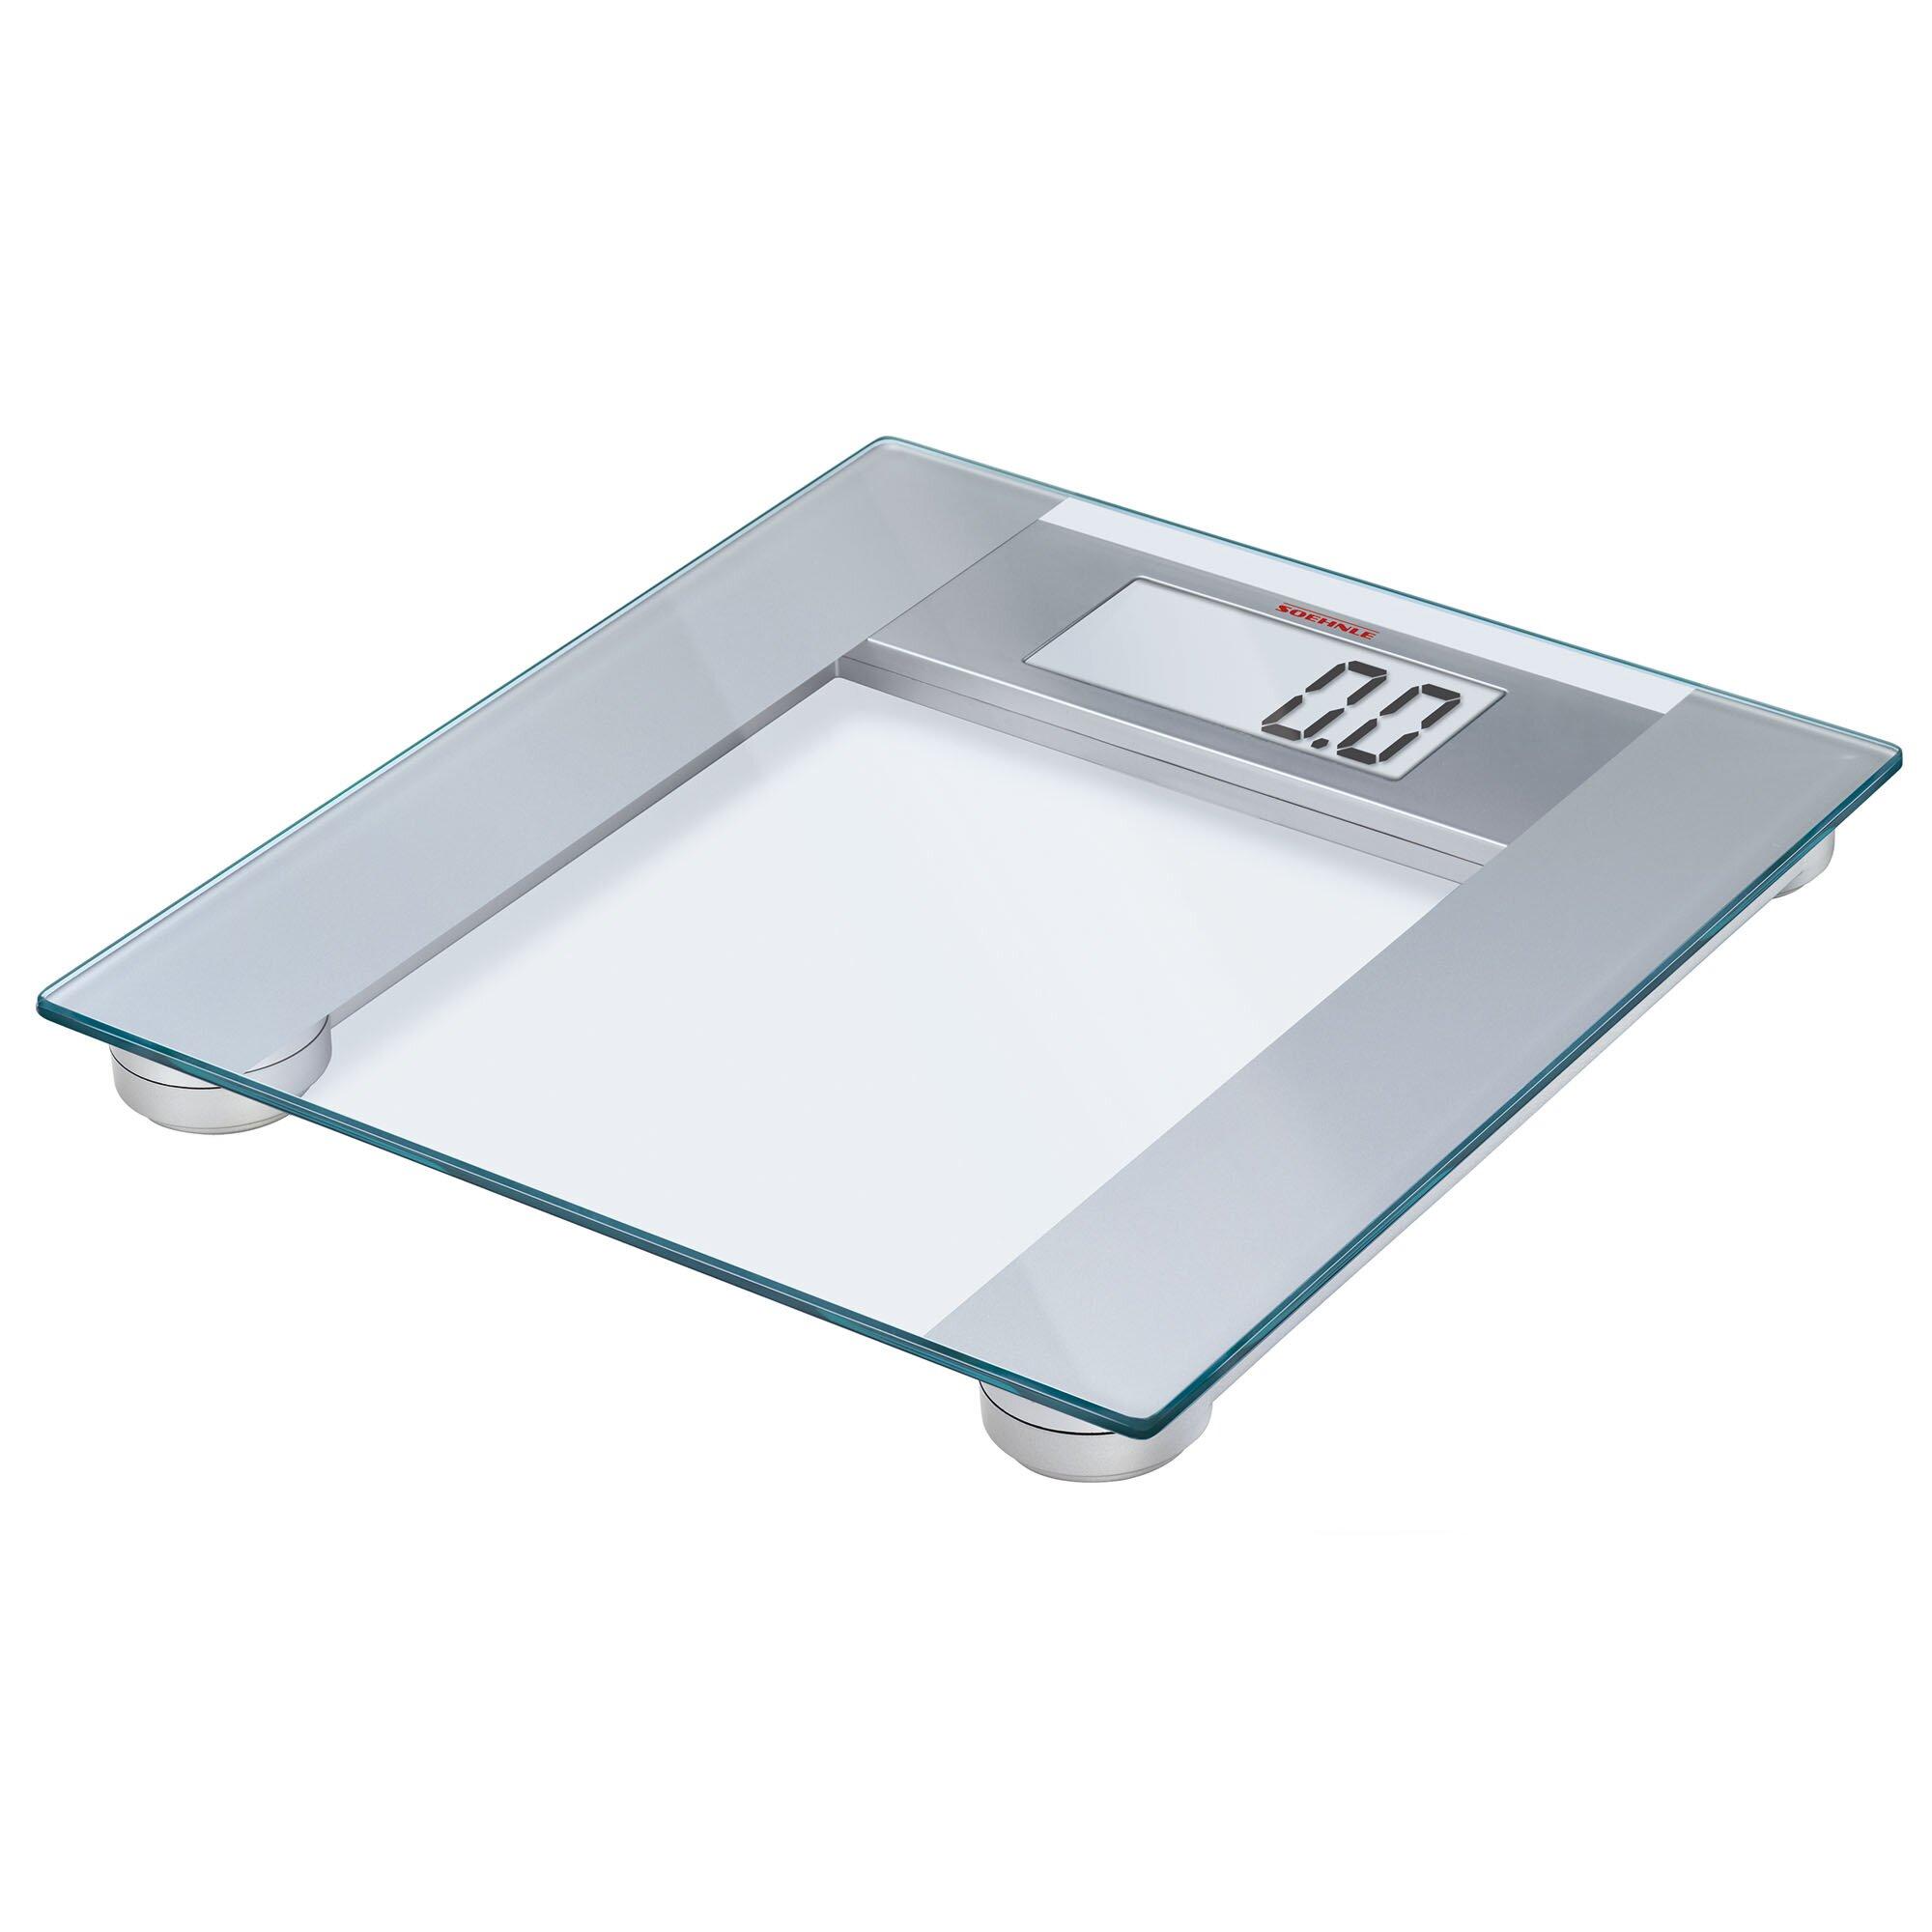 soehnle pharo 200 precision digital bathroom scale & reviews | wayfair